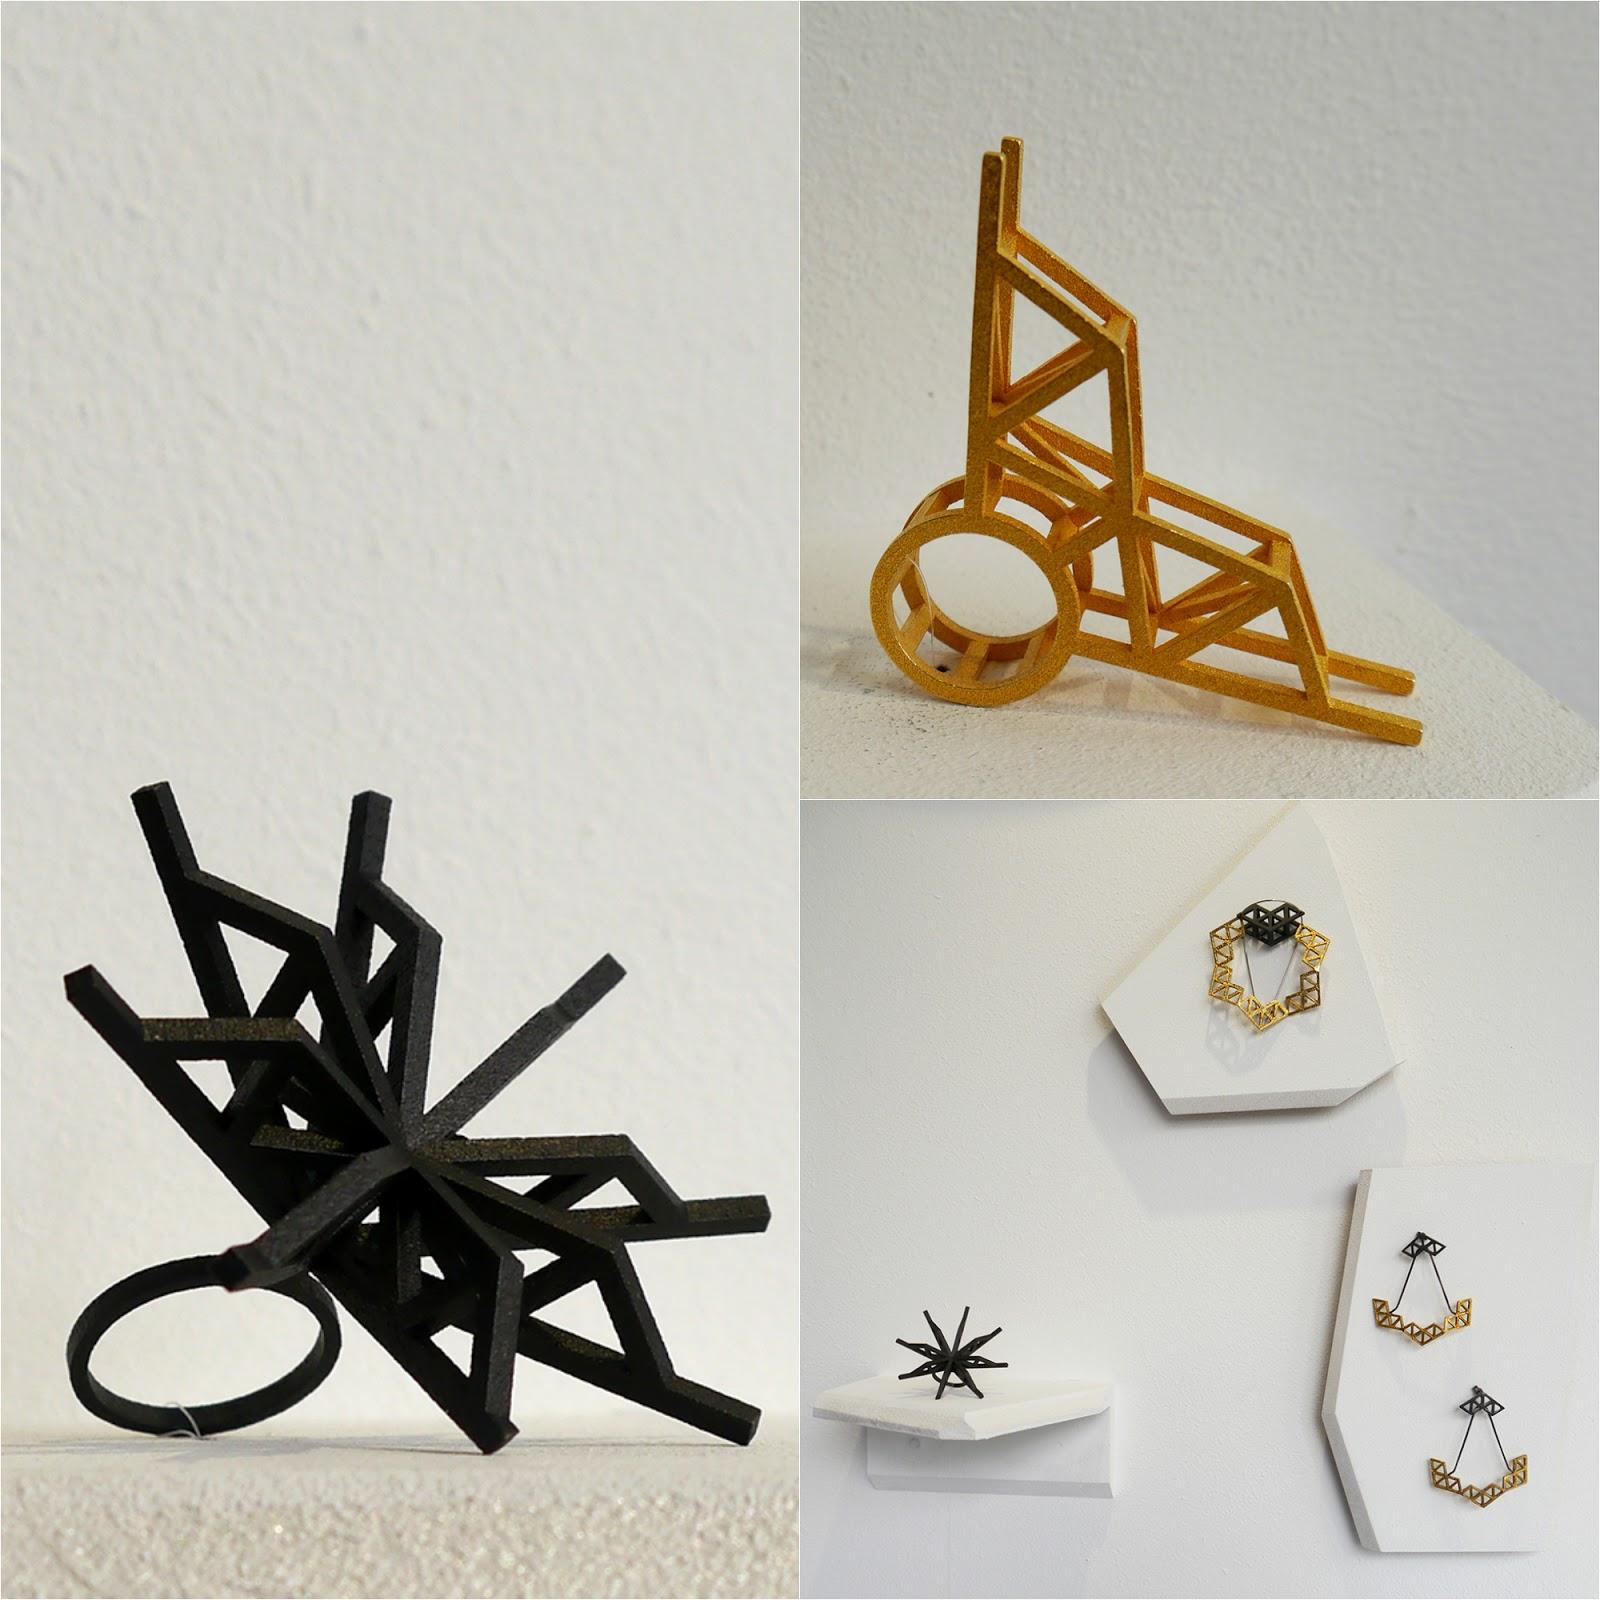 Duncan of Jordanstone College of Art and DEsign, DJCAD, degree show, #djcaddegreeshow, #djcaddegreeshow15, Degree Show 2015, Jewellery, jewellery and metal design, Lesley Conlan